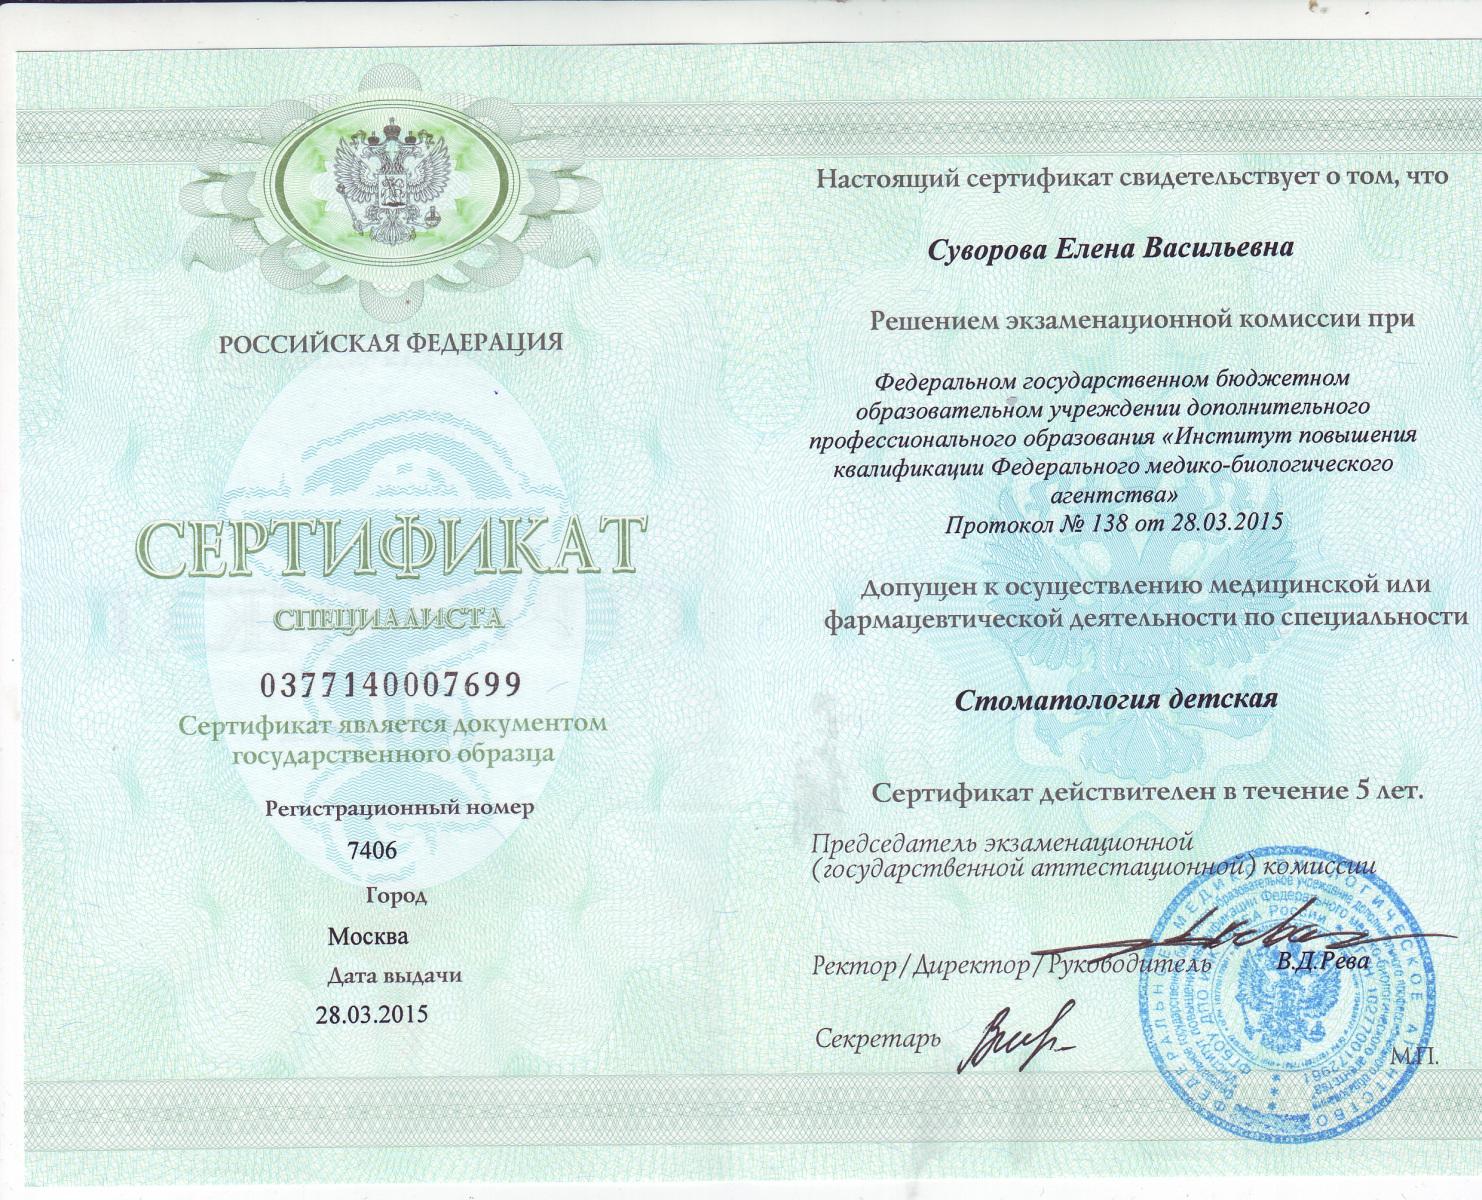 сертиф0001